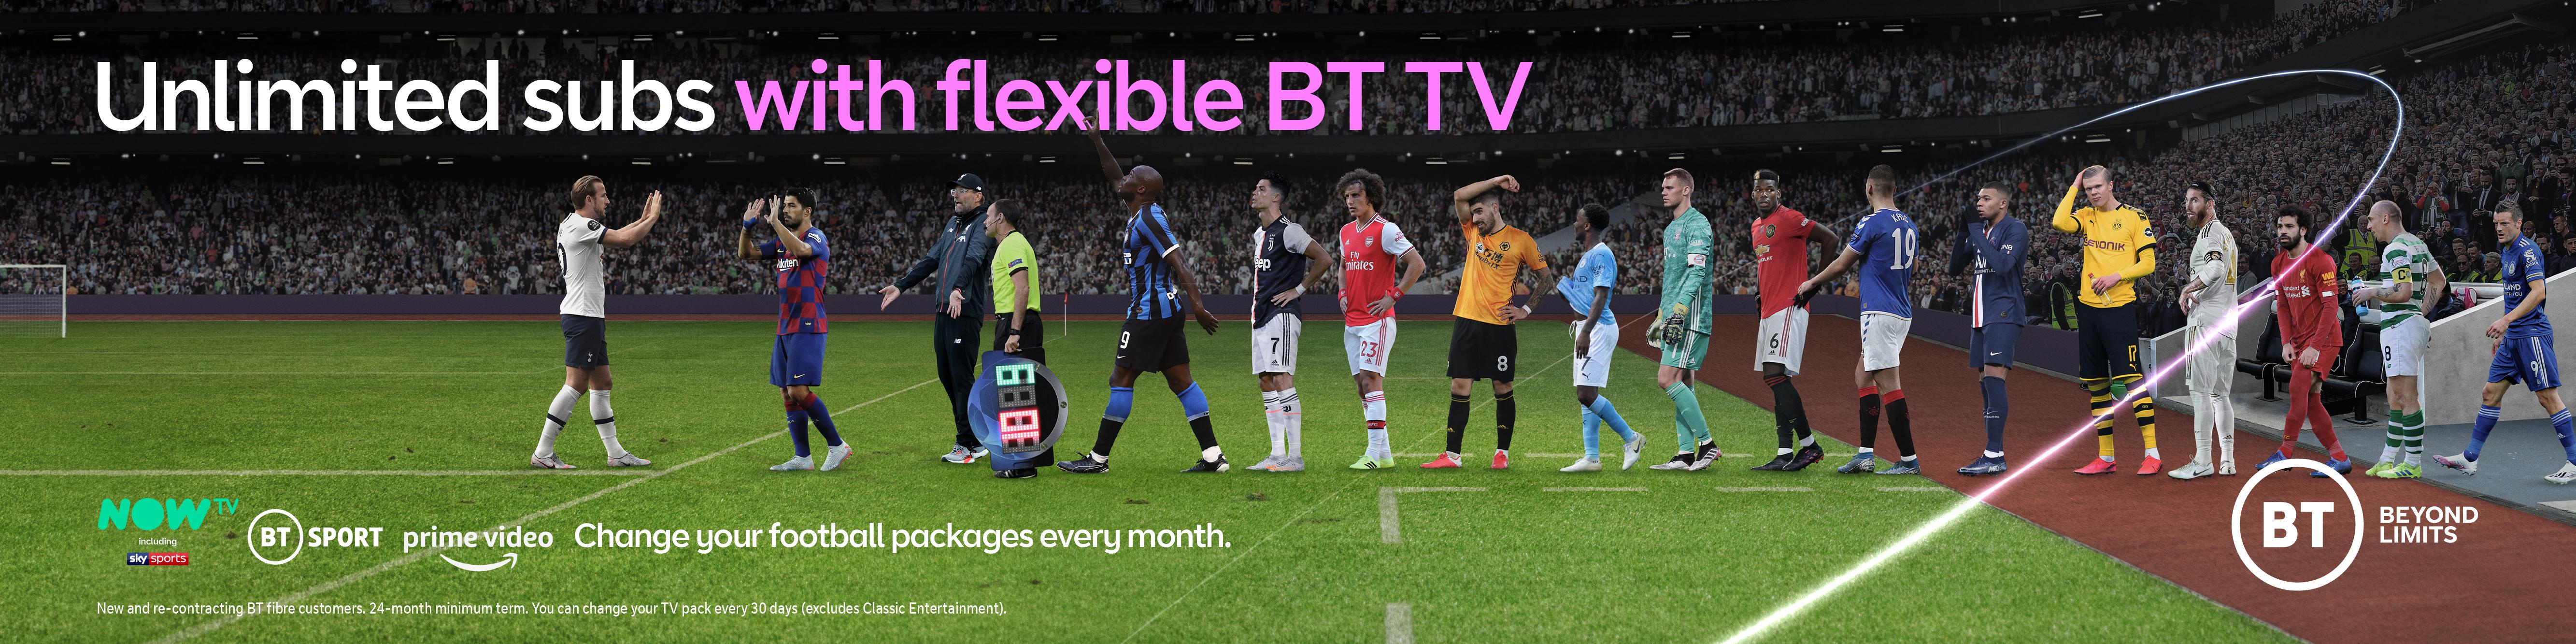 BT Sport: campaign includes outdoor activity